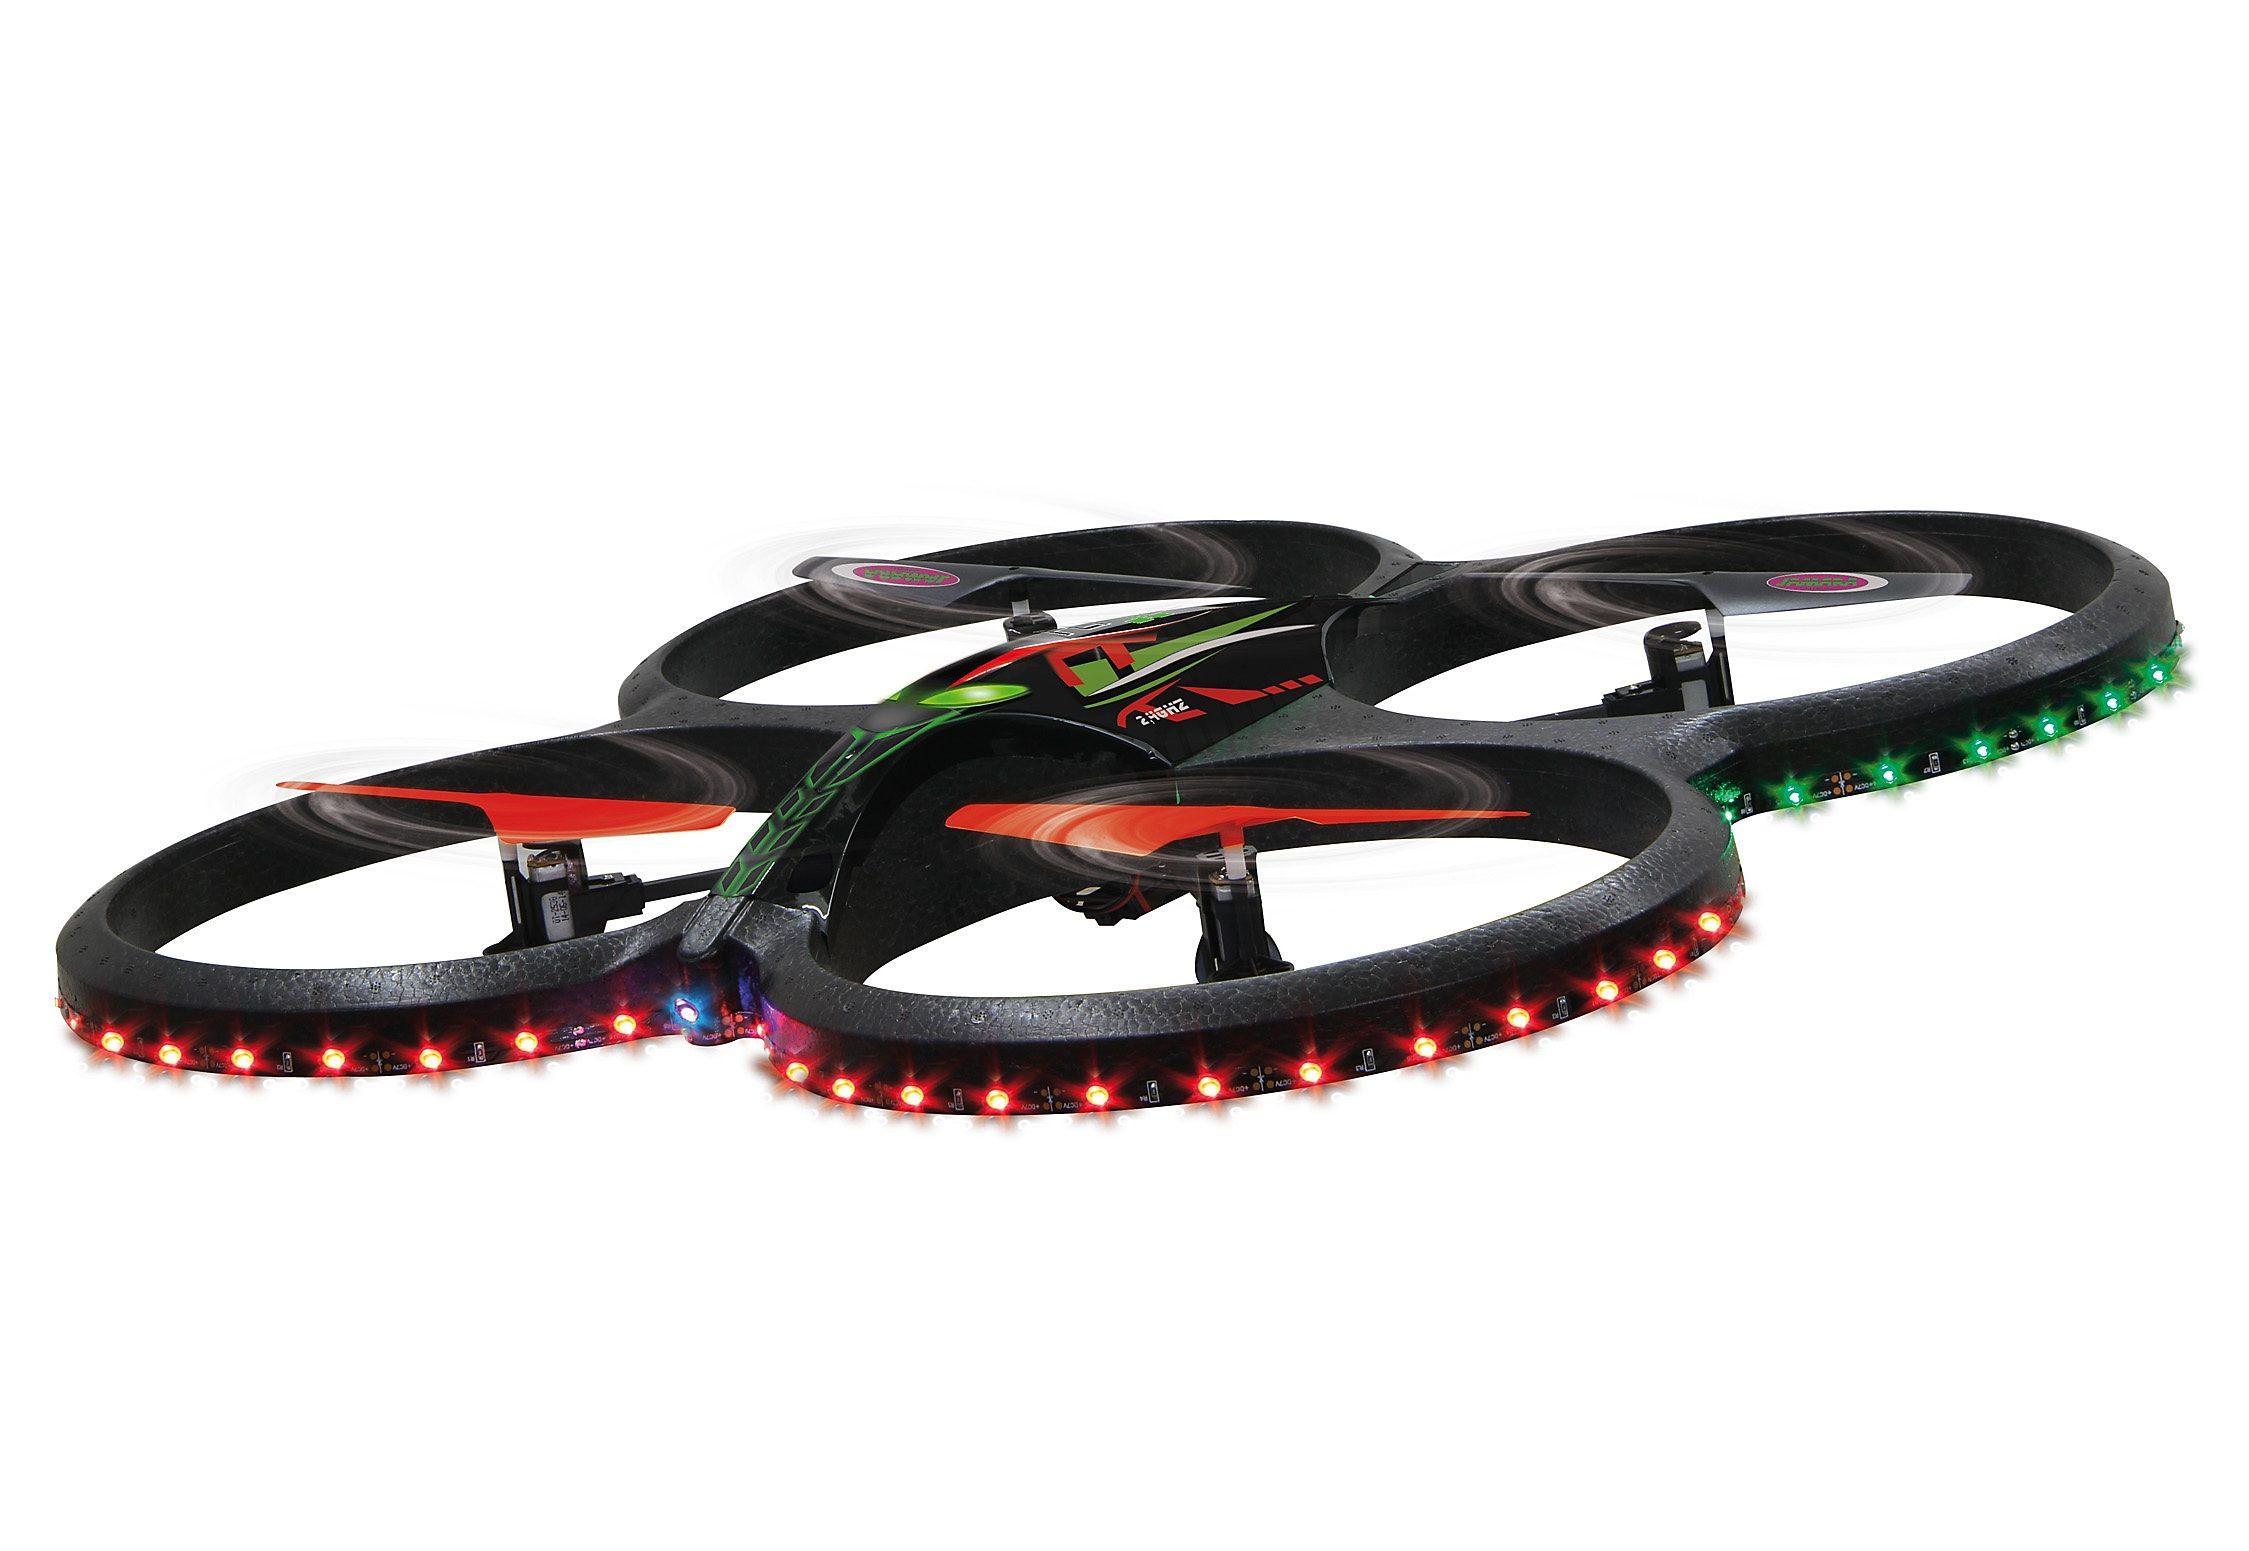 JAMARA RC Quadrocopter, »Flyscout mit Kamera, 2,4 GHz«